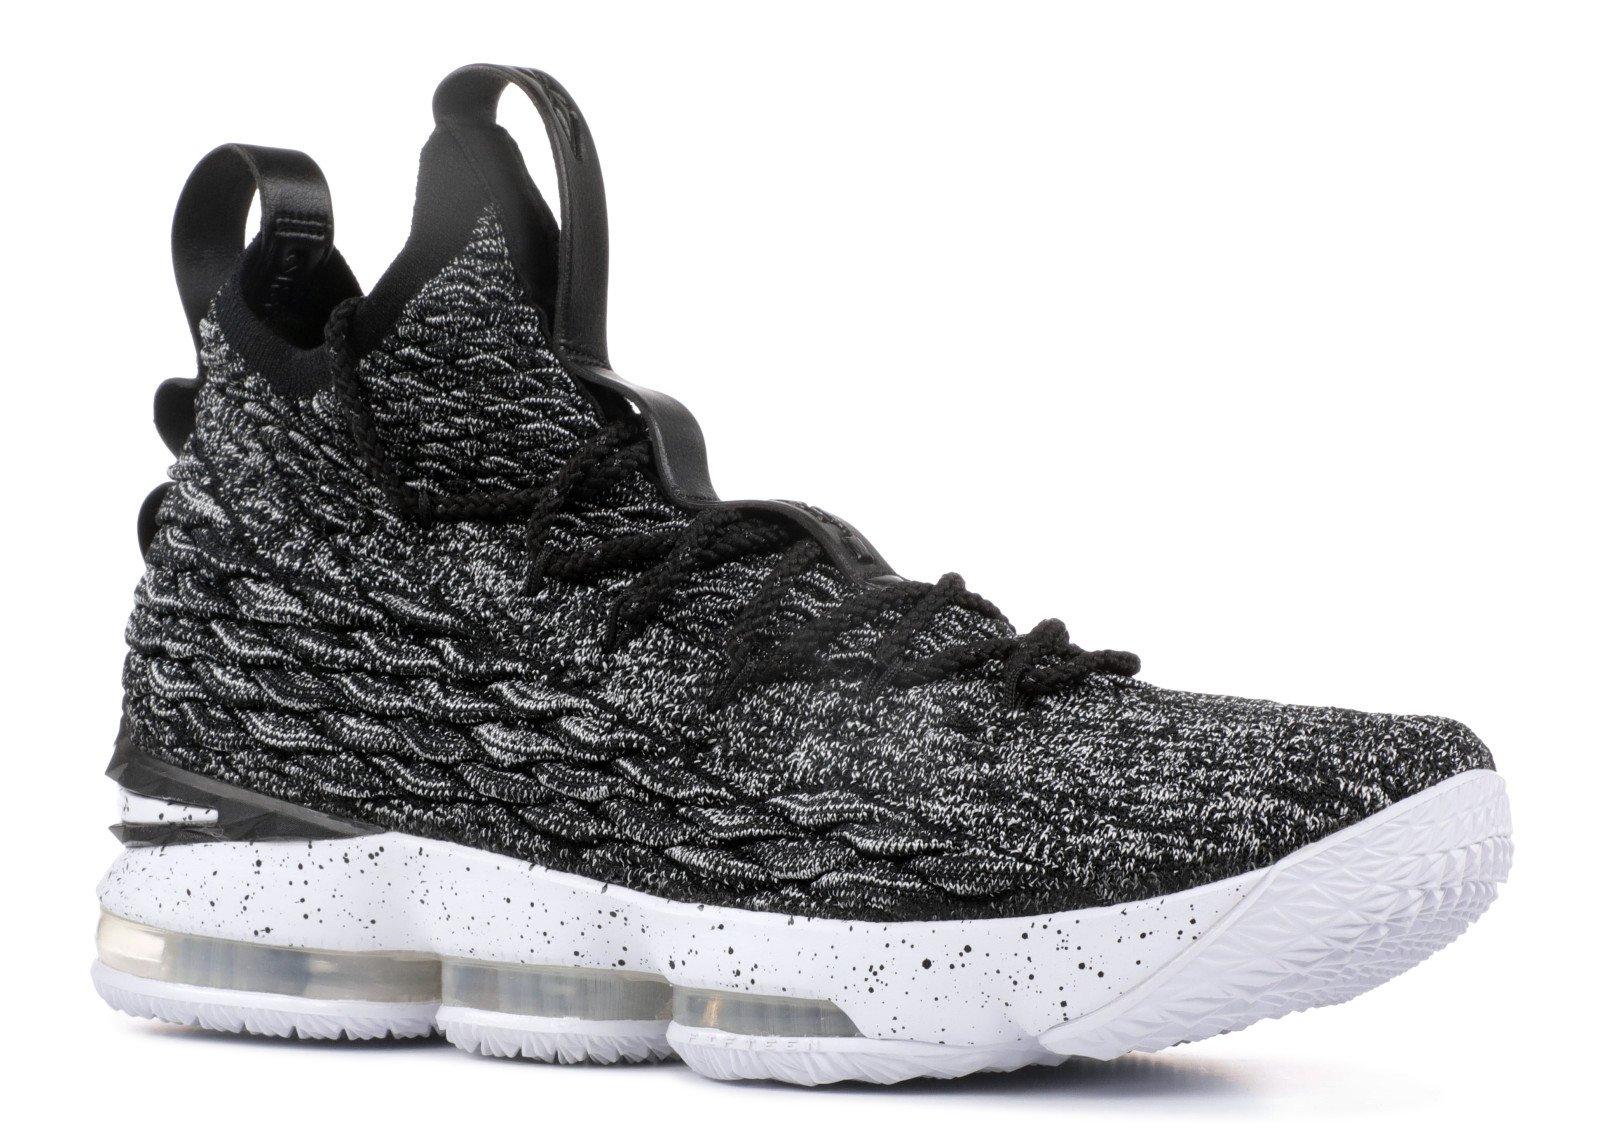 88e8ffd7c71 Nike Lebron XV Ashes basketball shoes lebron james black white-white NEW  897648-